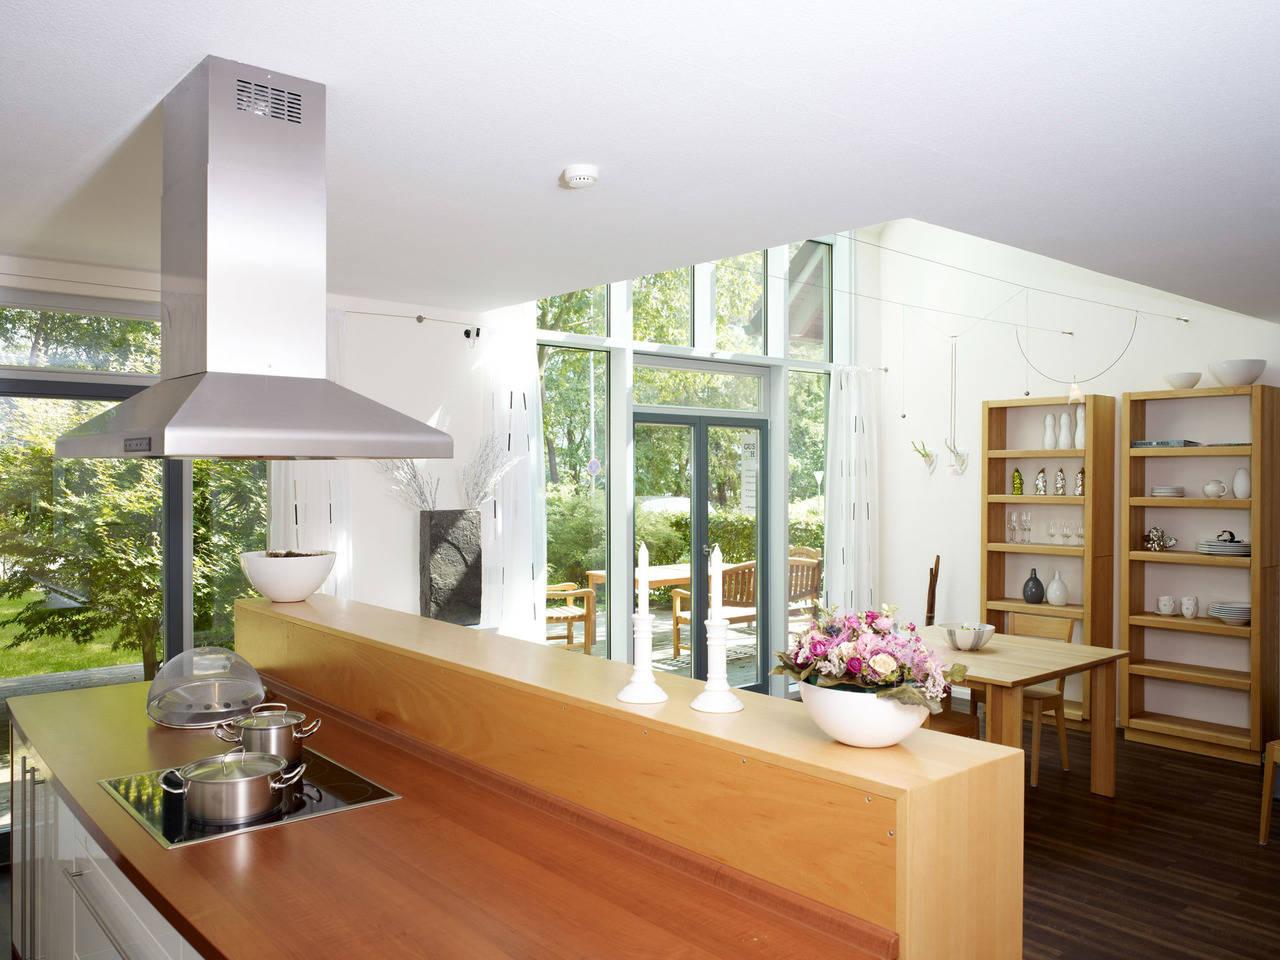 Musterhaus Svenja von Gussek Haus - Küche